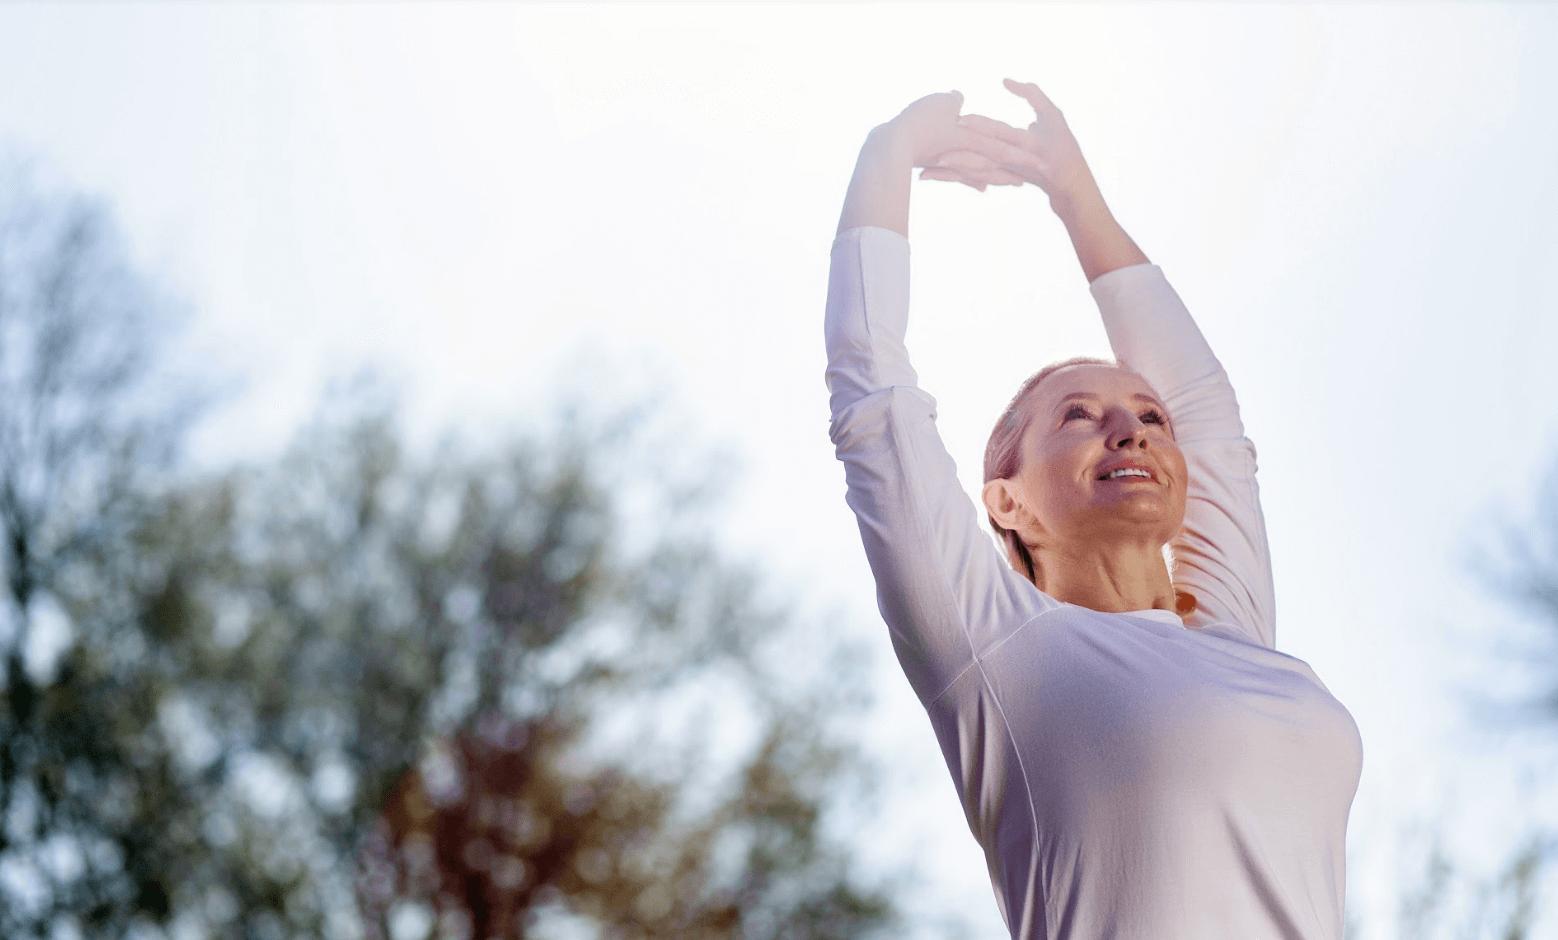 improve-health-strength-physical-activity